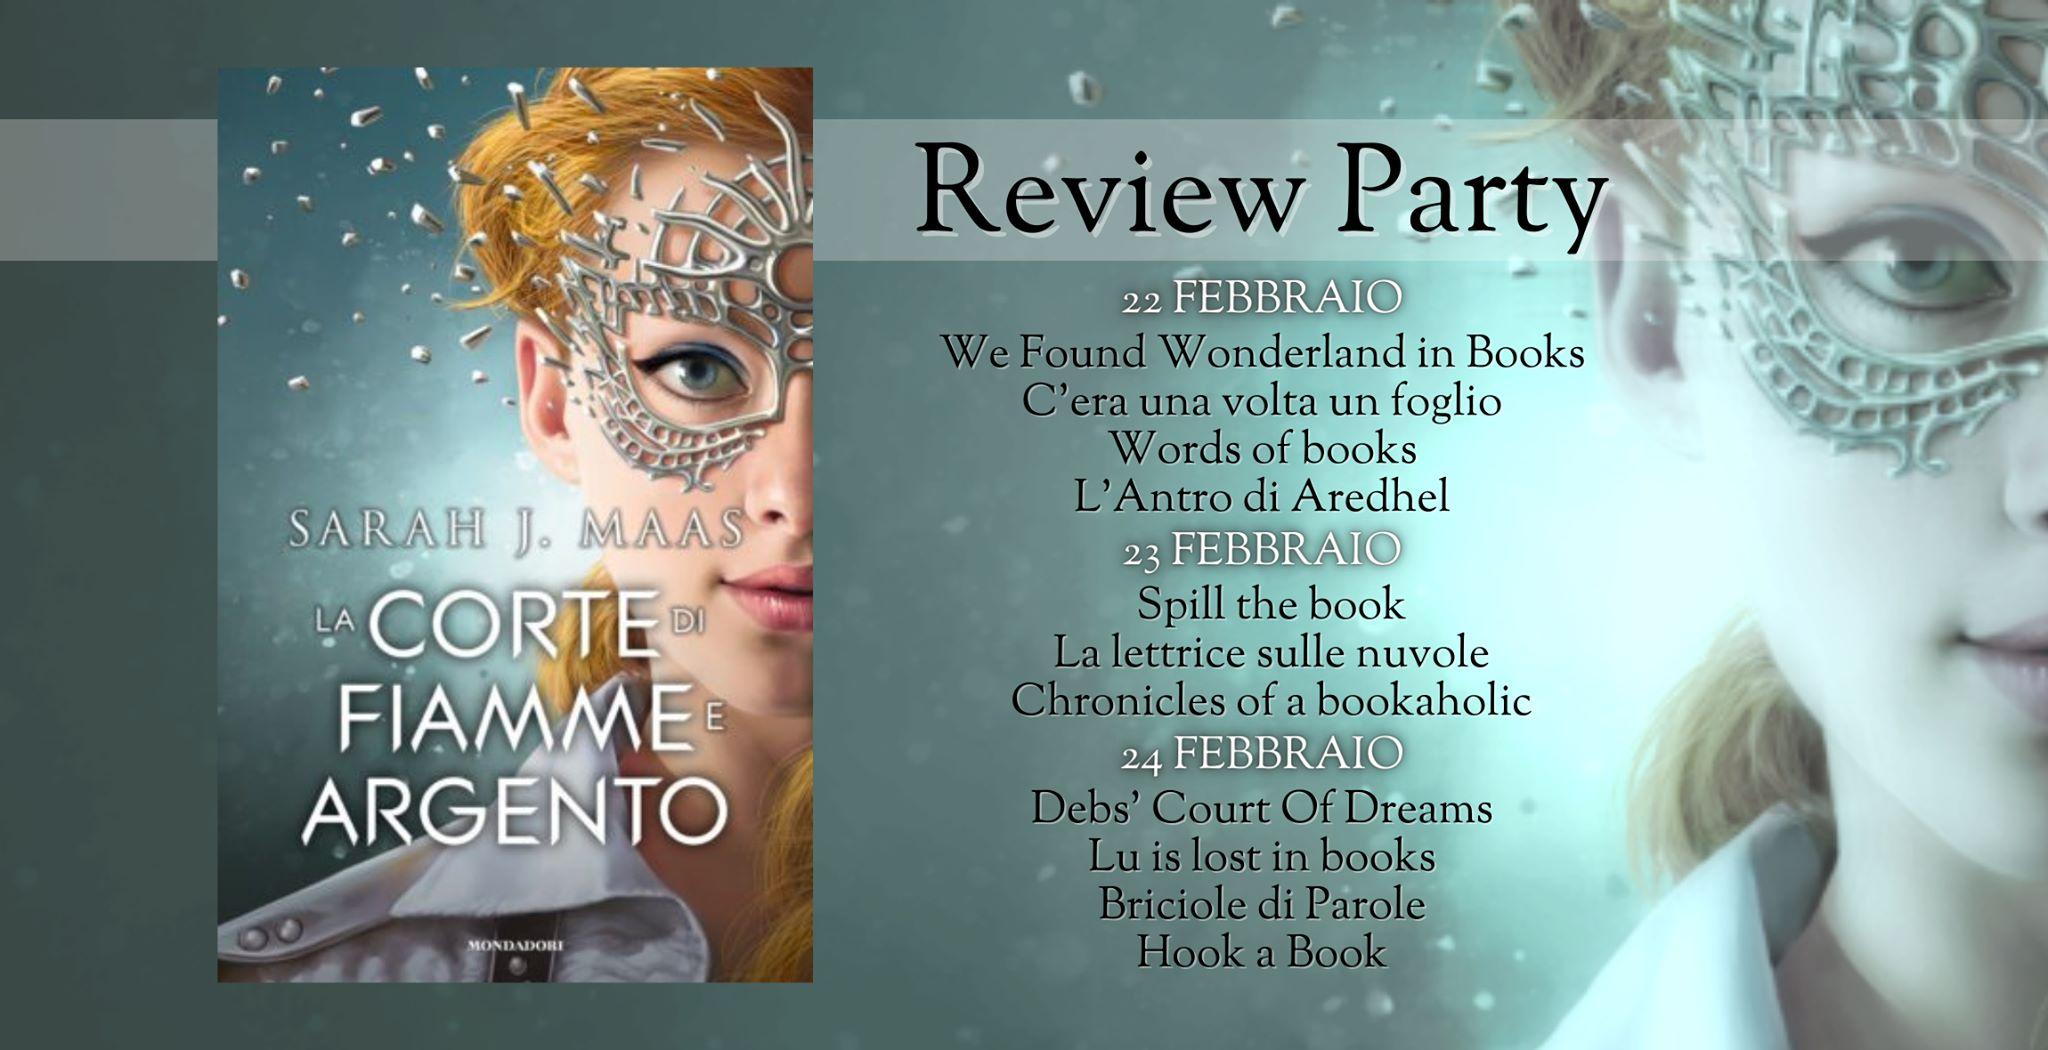 "Calendario del review party dedicato al libro ""La corte di fiamme e argento"" di Sarah J. Maas"